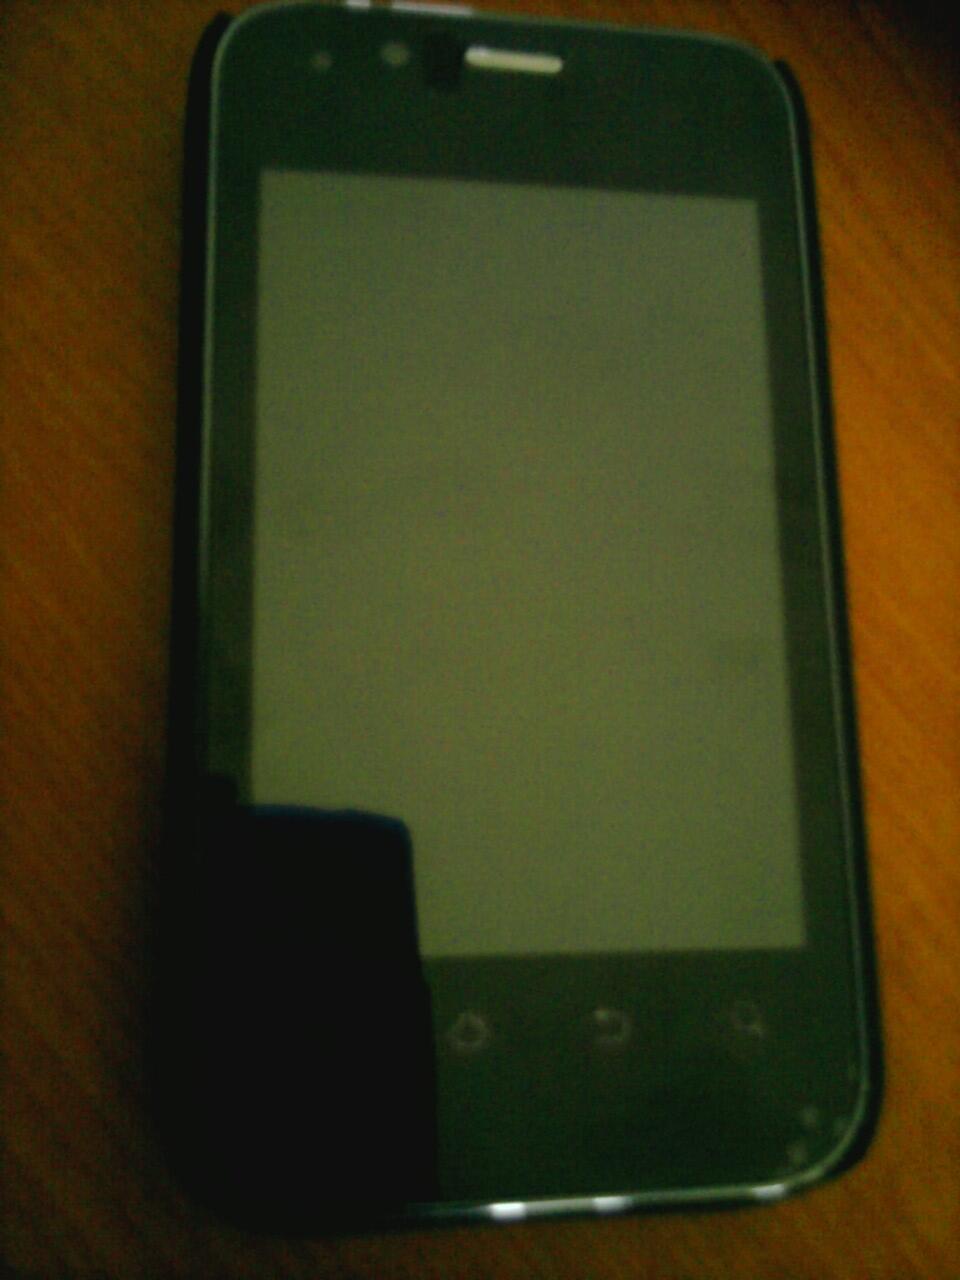 Nexcom Apollo - Hape Pertama Nexcom Android - Spek Gahar - Malang